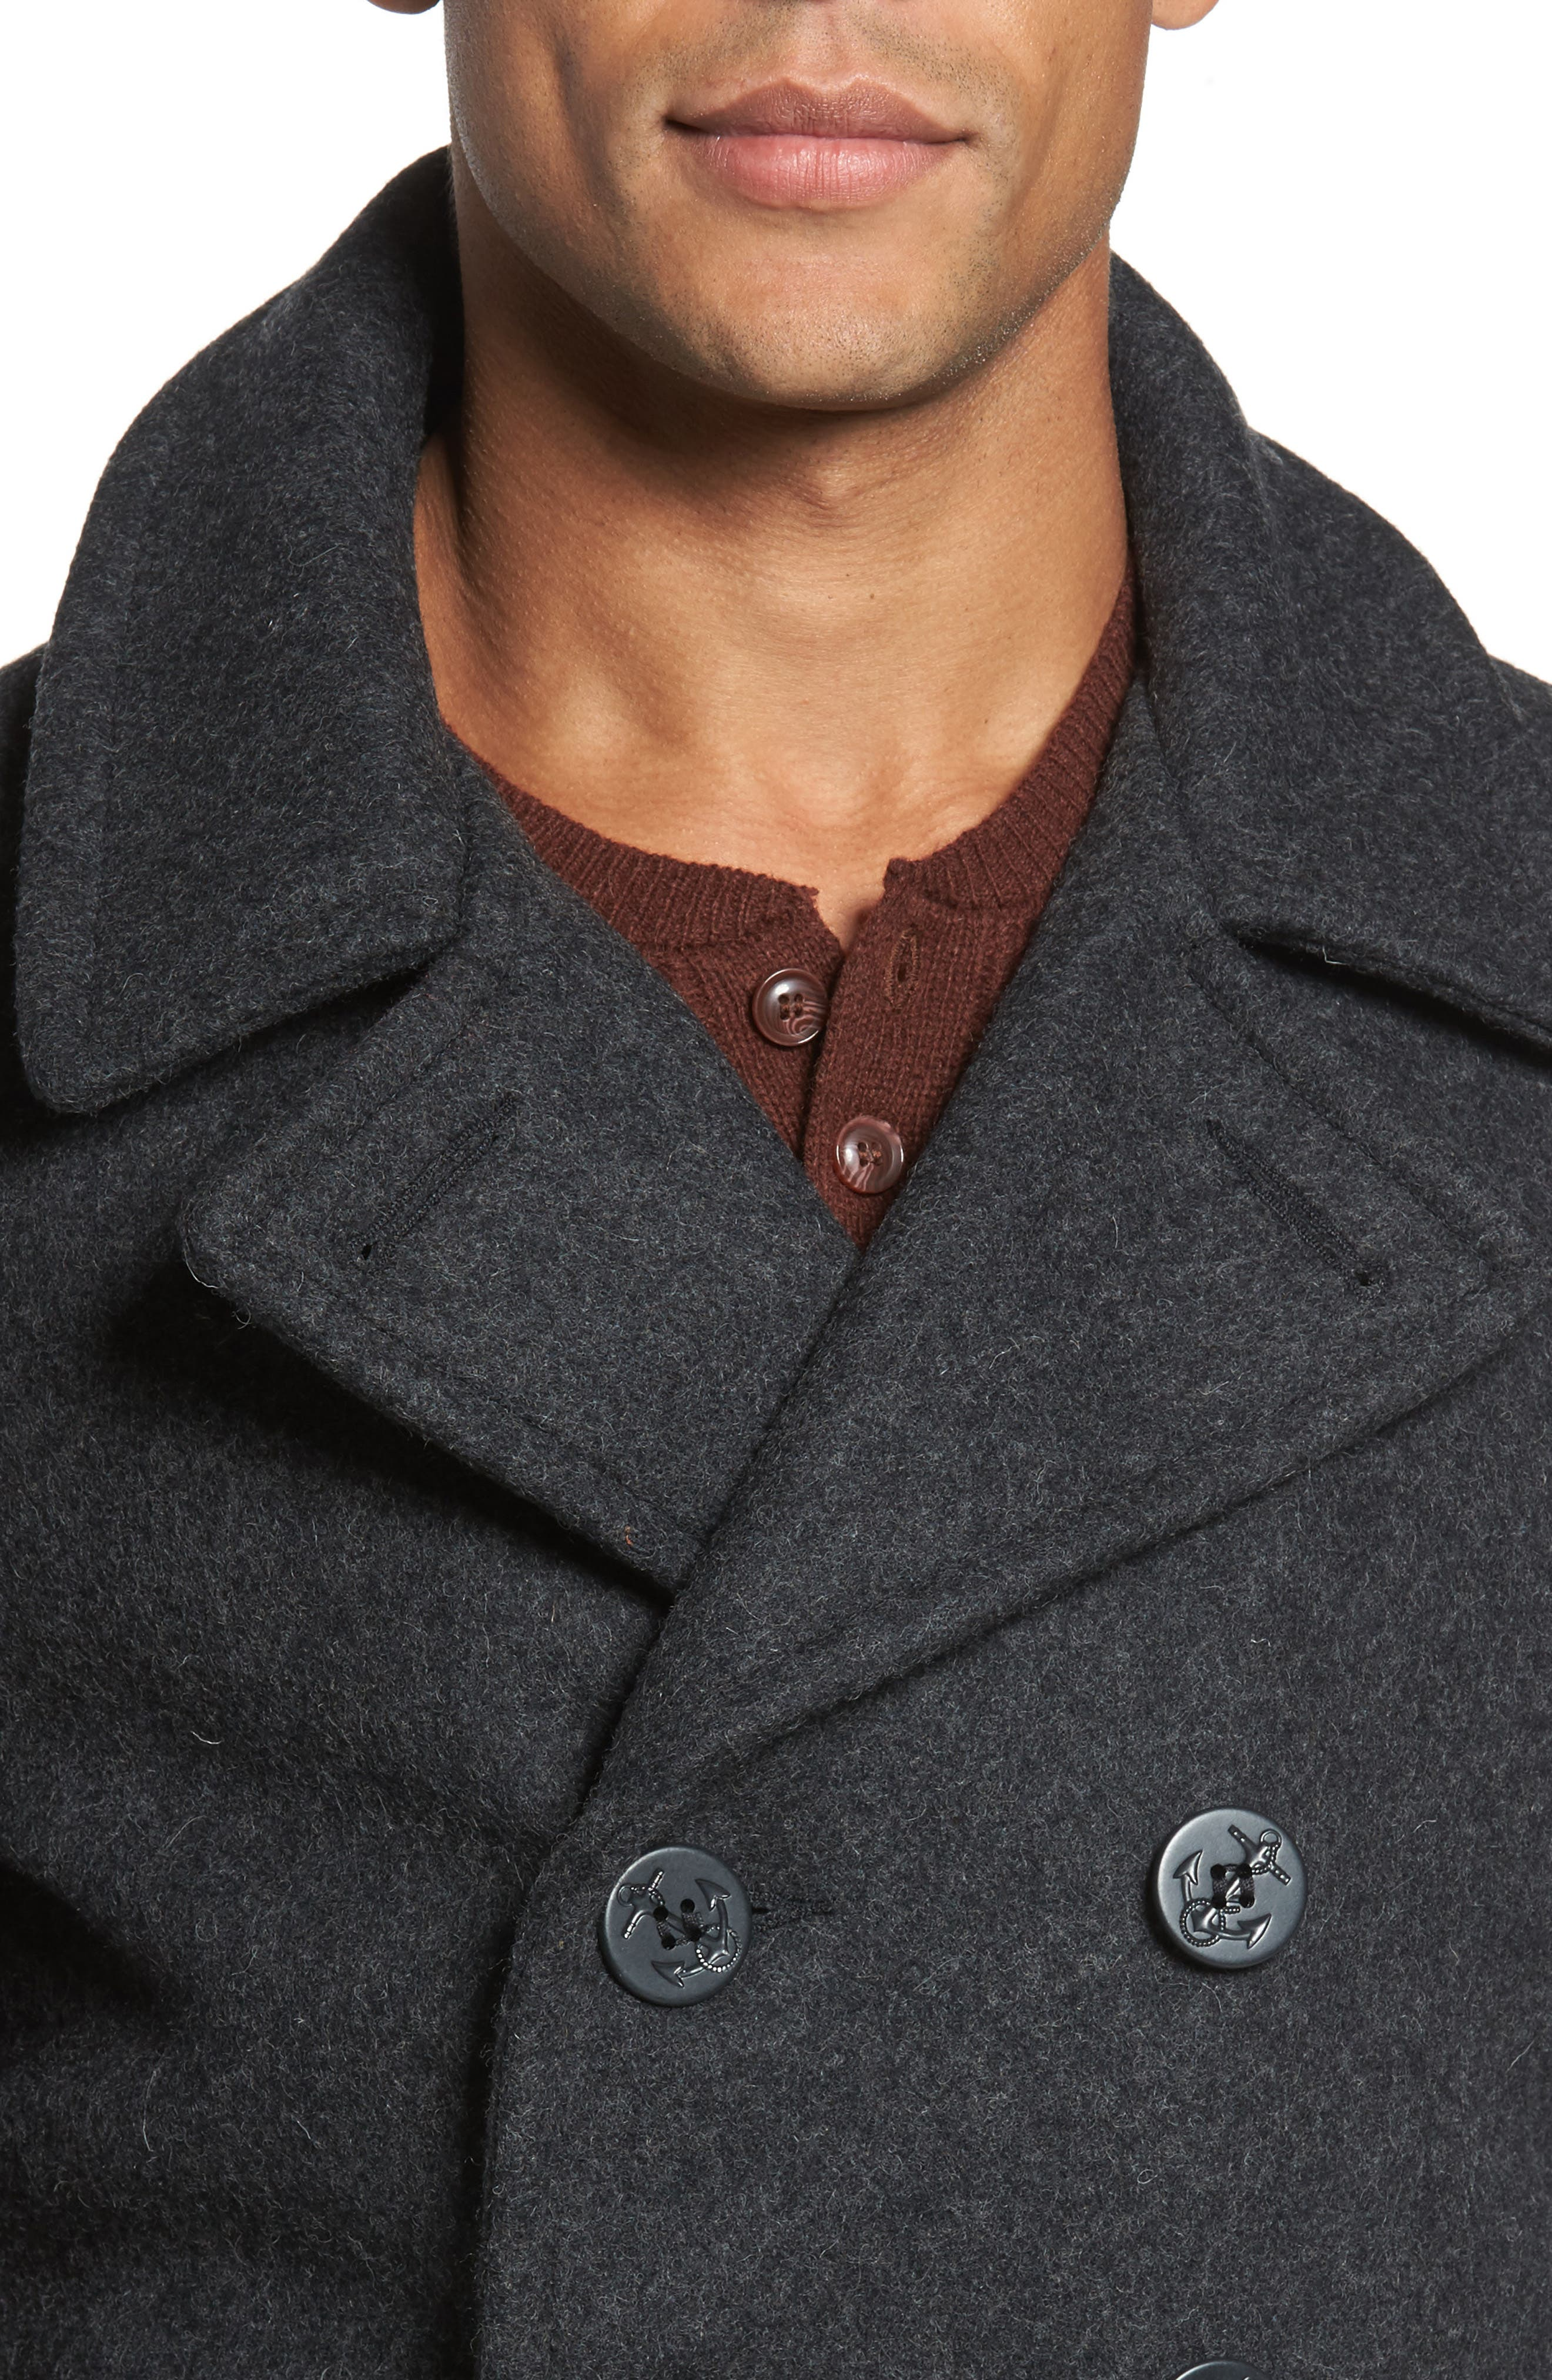 Slim Fit Melton Wool Blend Peacoat,                             Alternate thumbnail 4, color,                             022